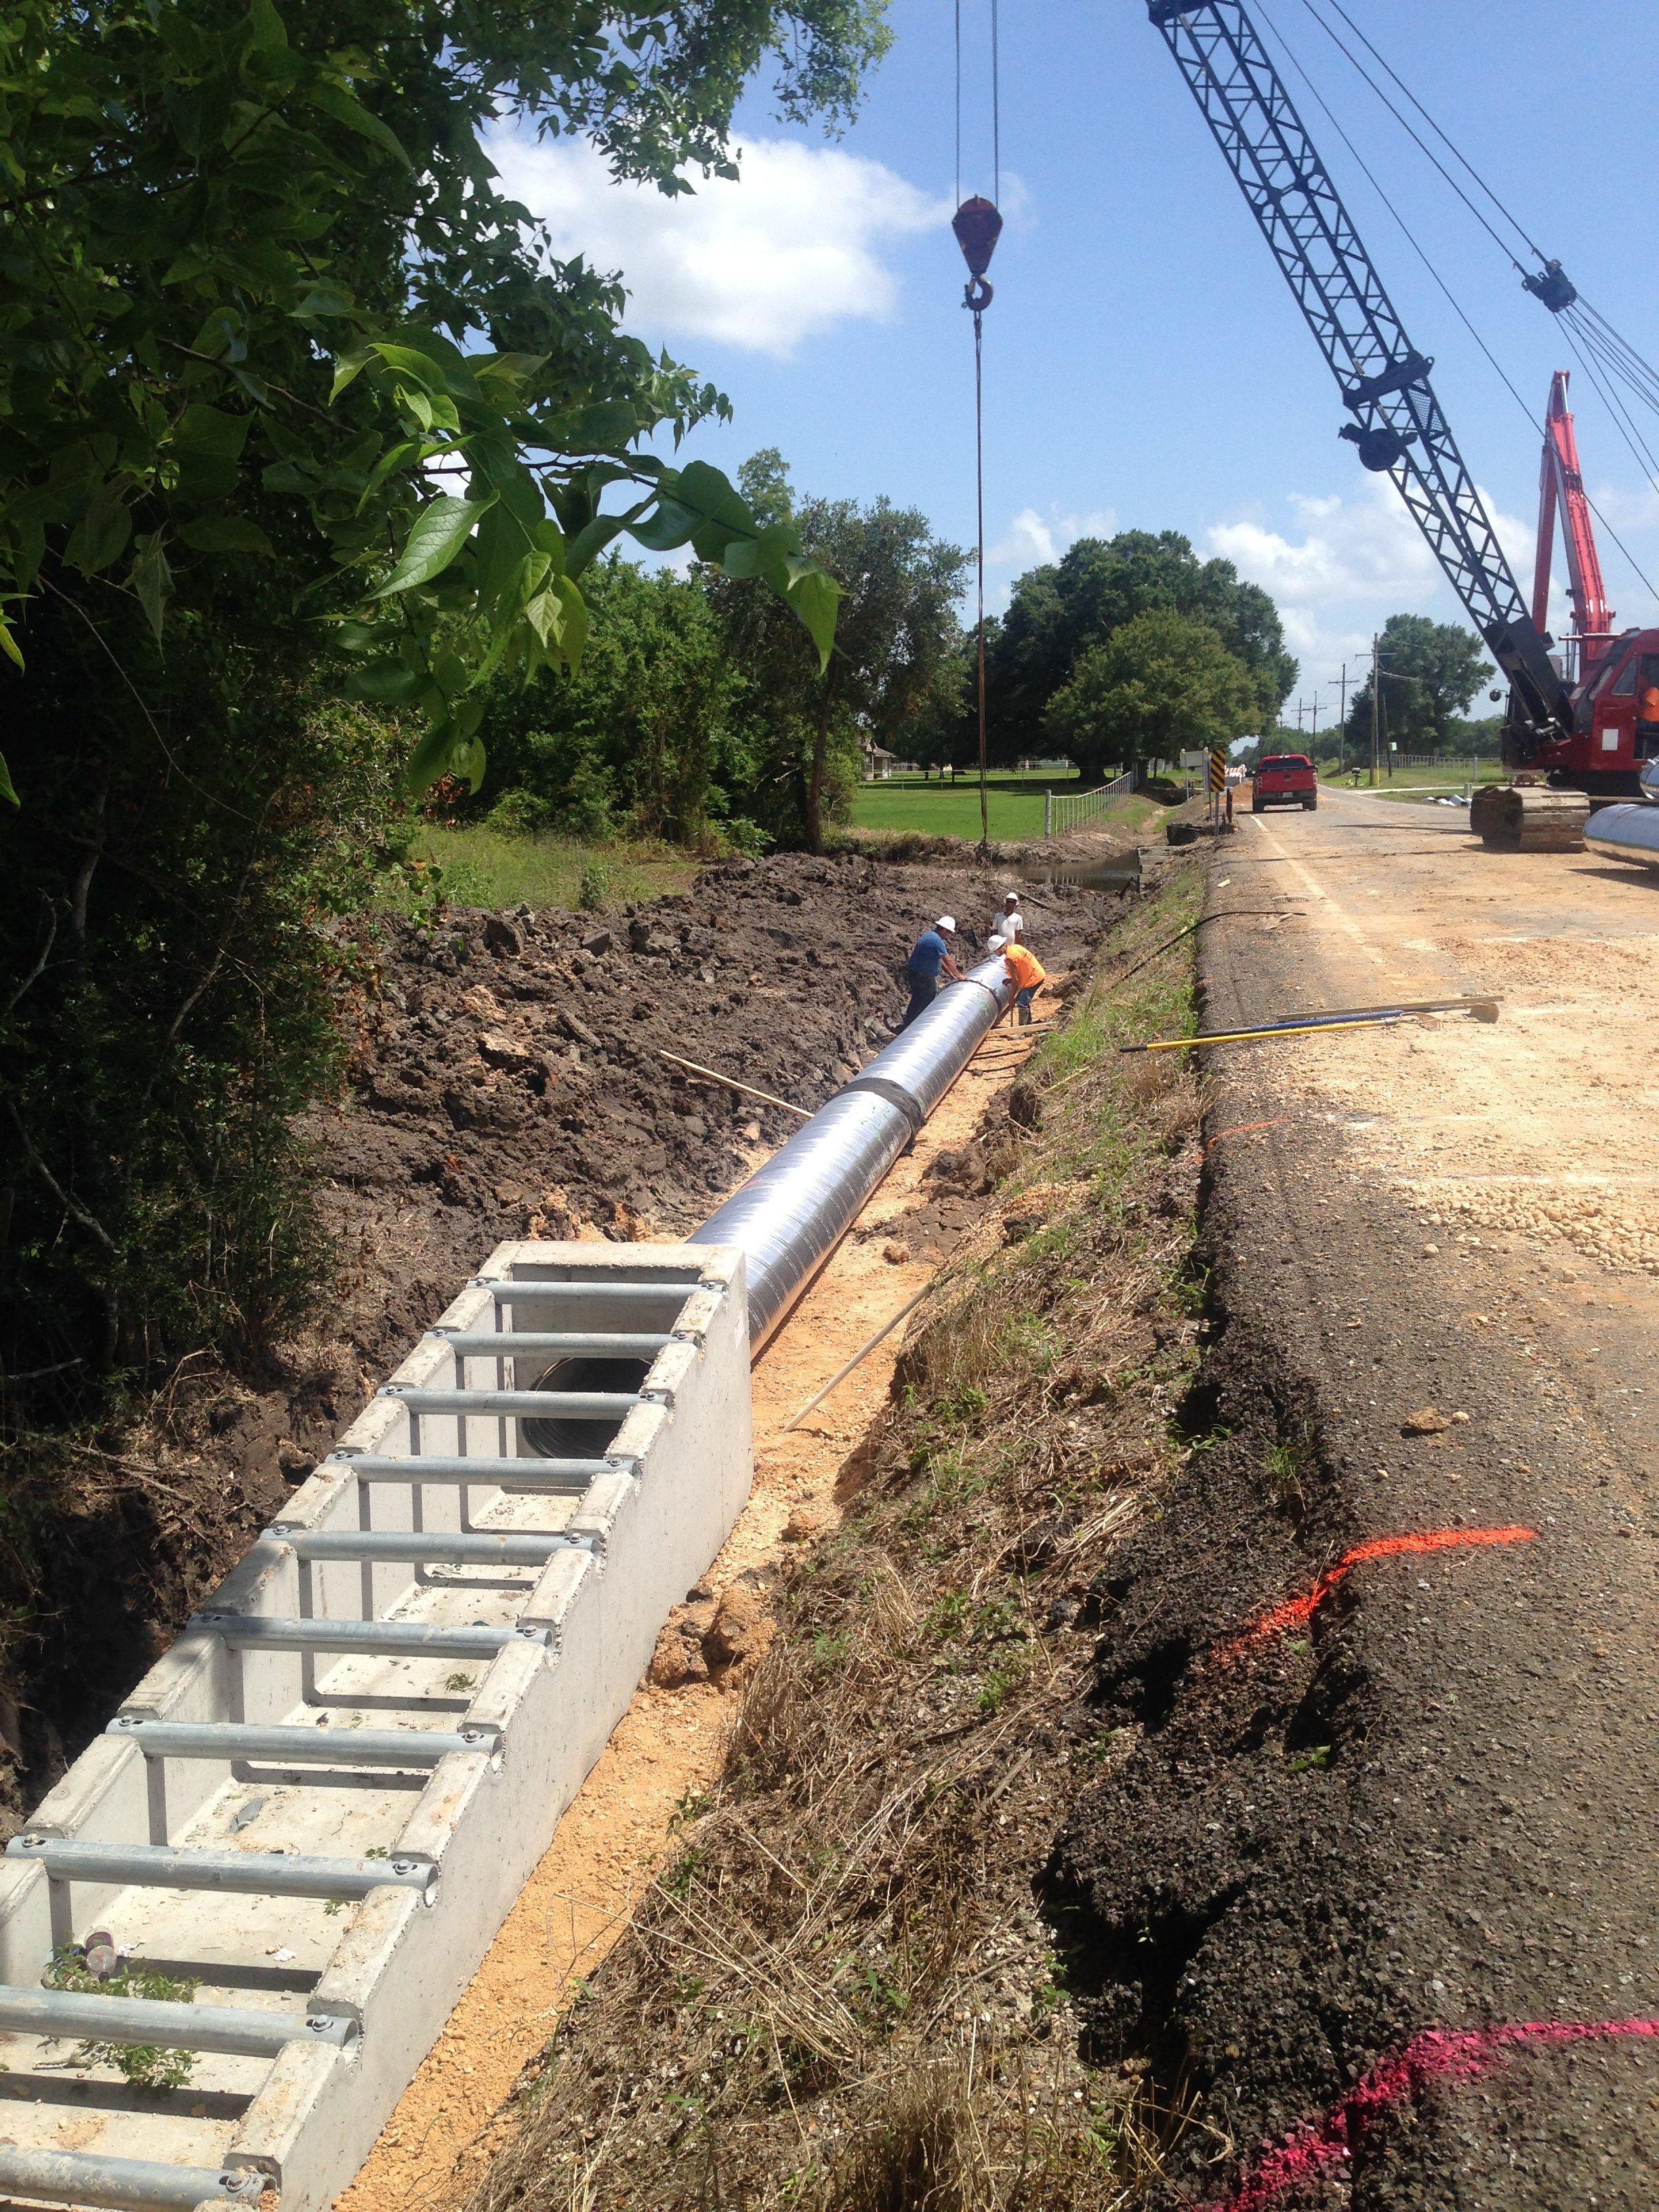 guinn construction company servicing louisiana